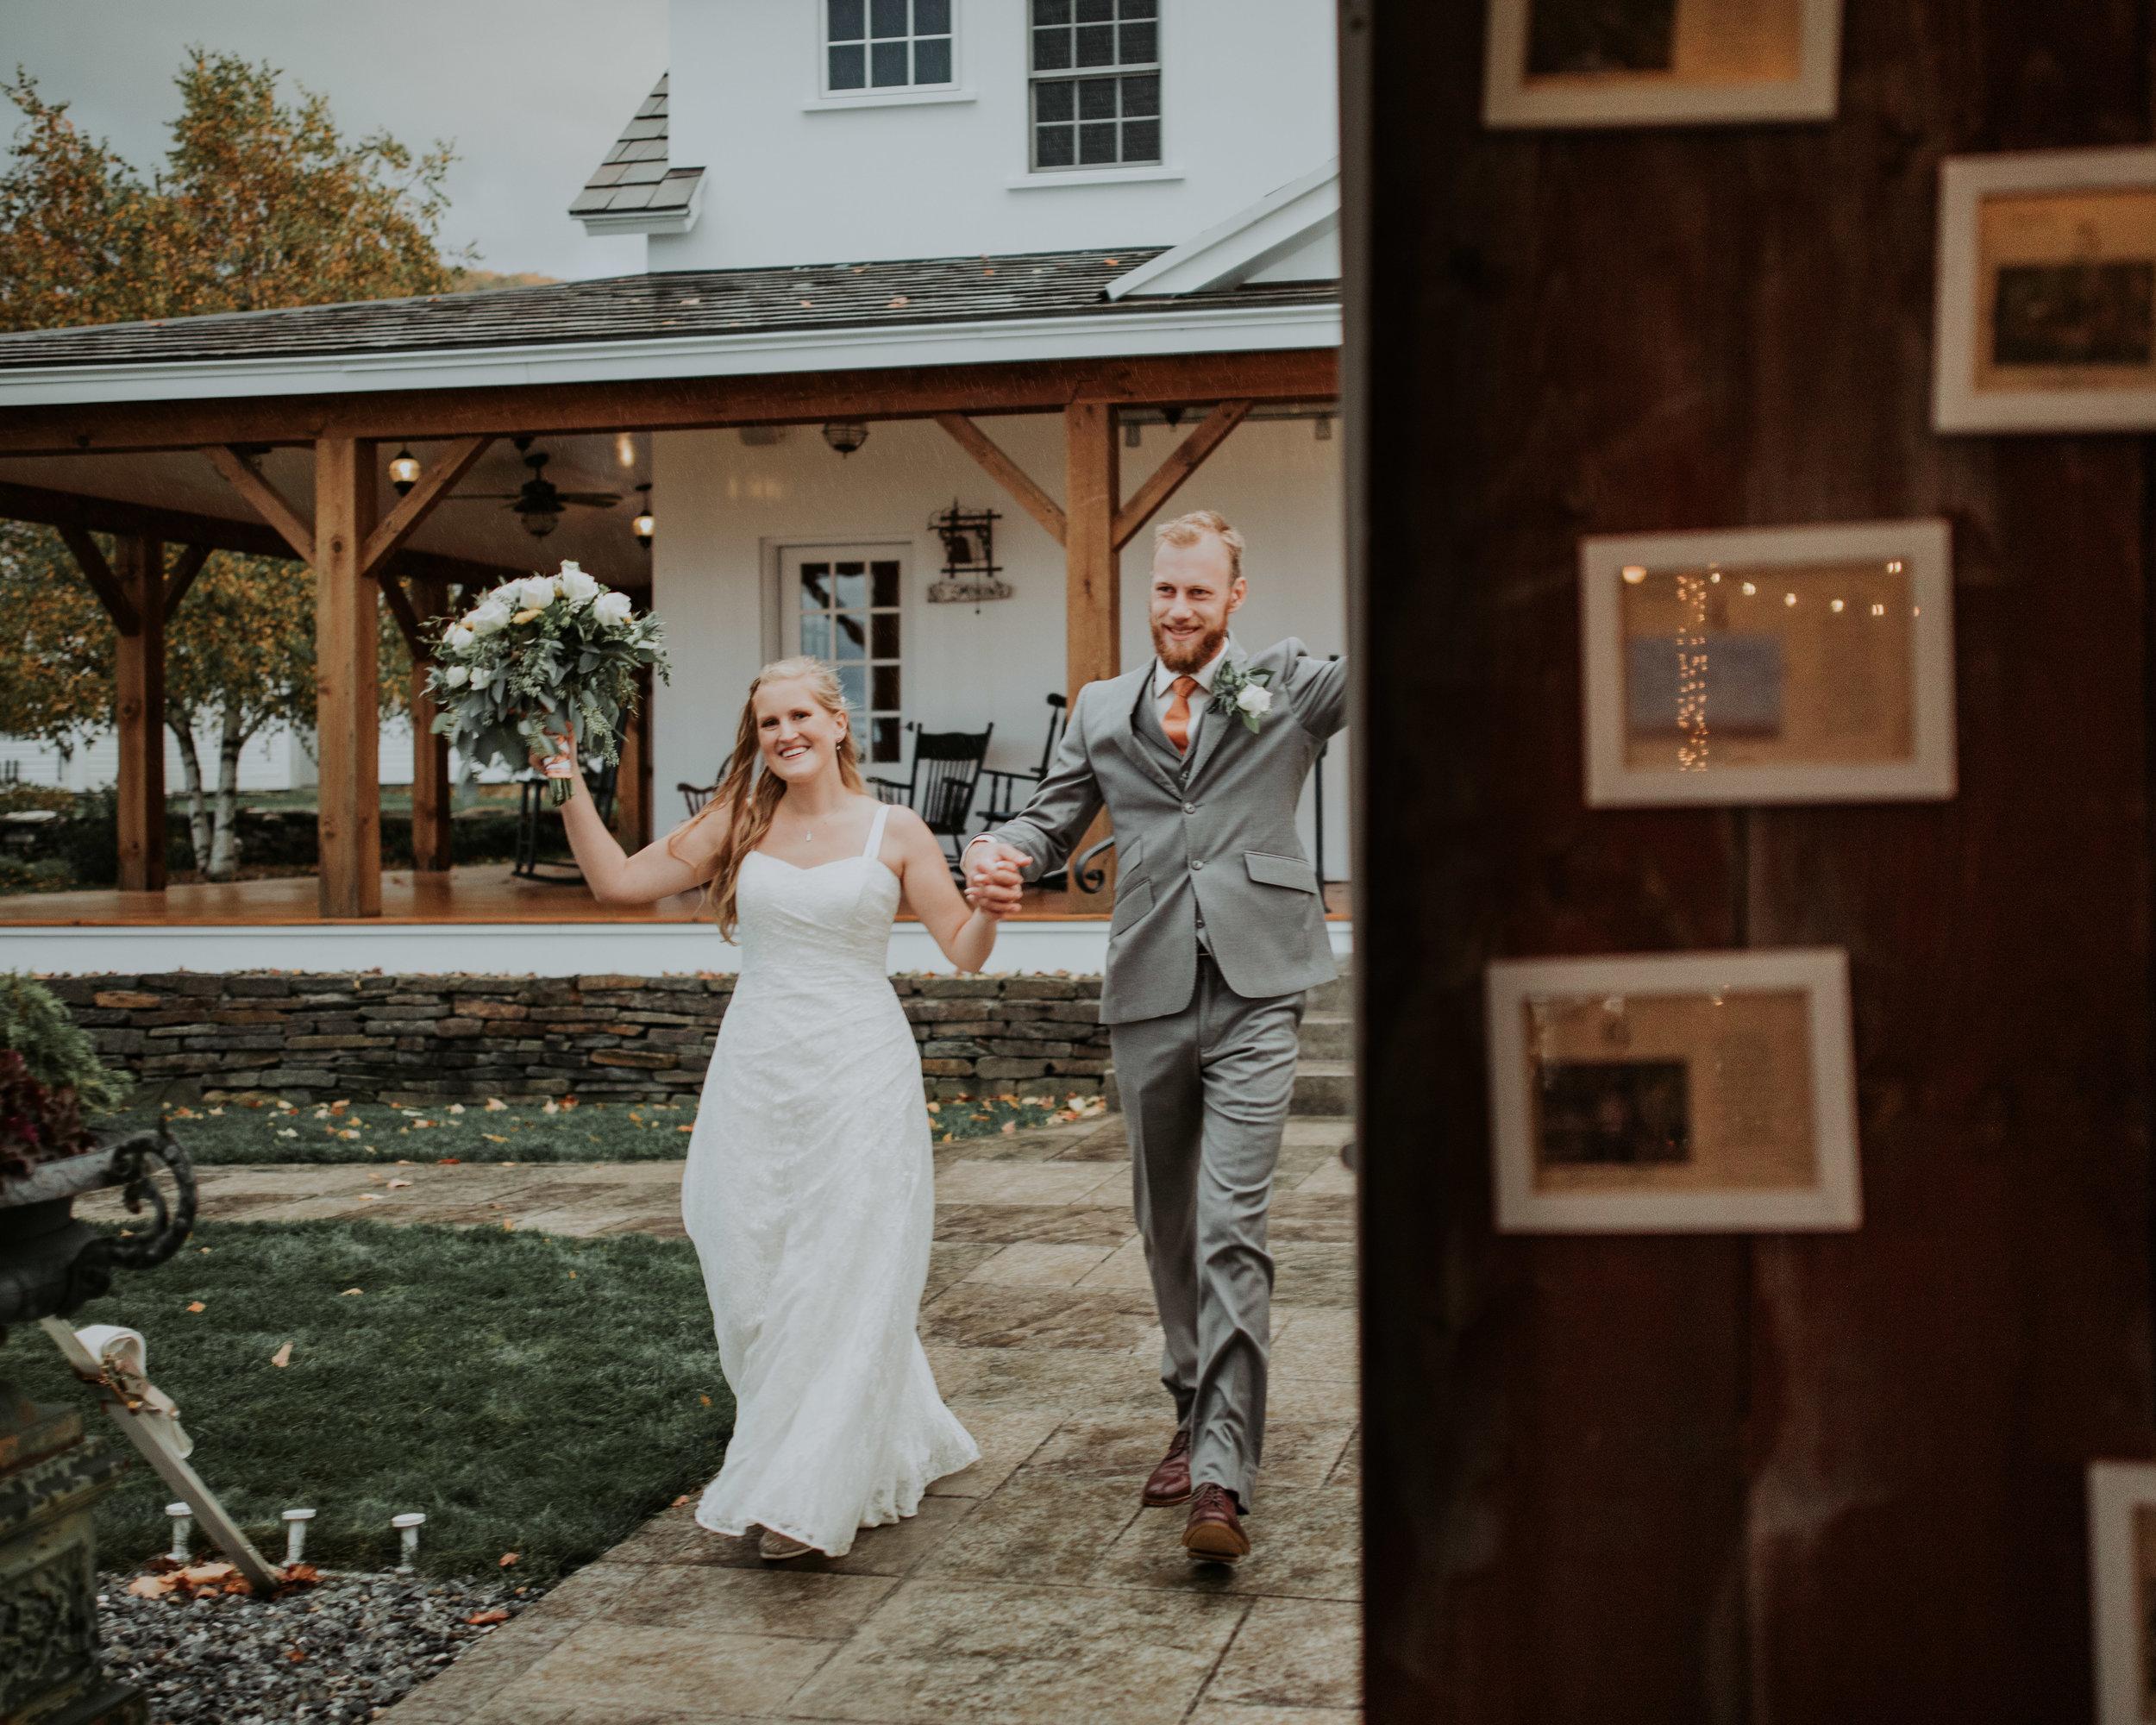 Vermont Wedding | Lorianna Weathers Photography-1410.jpg